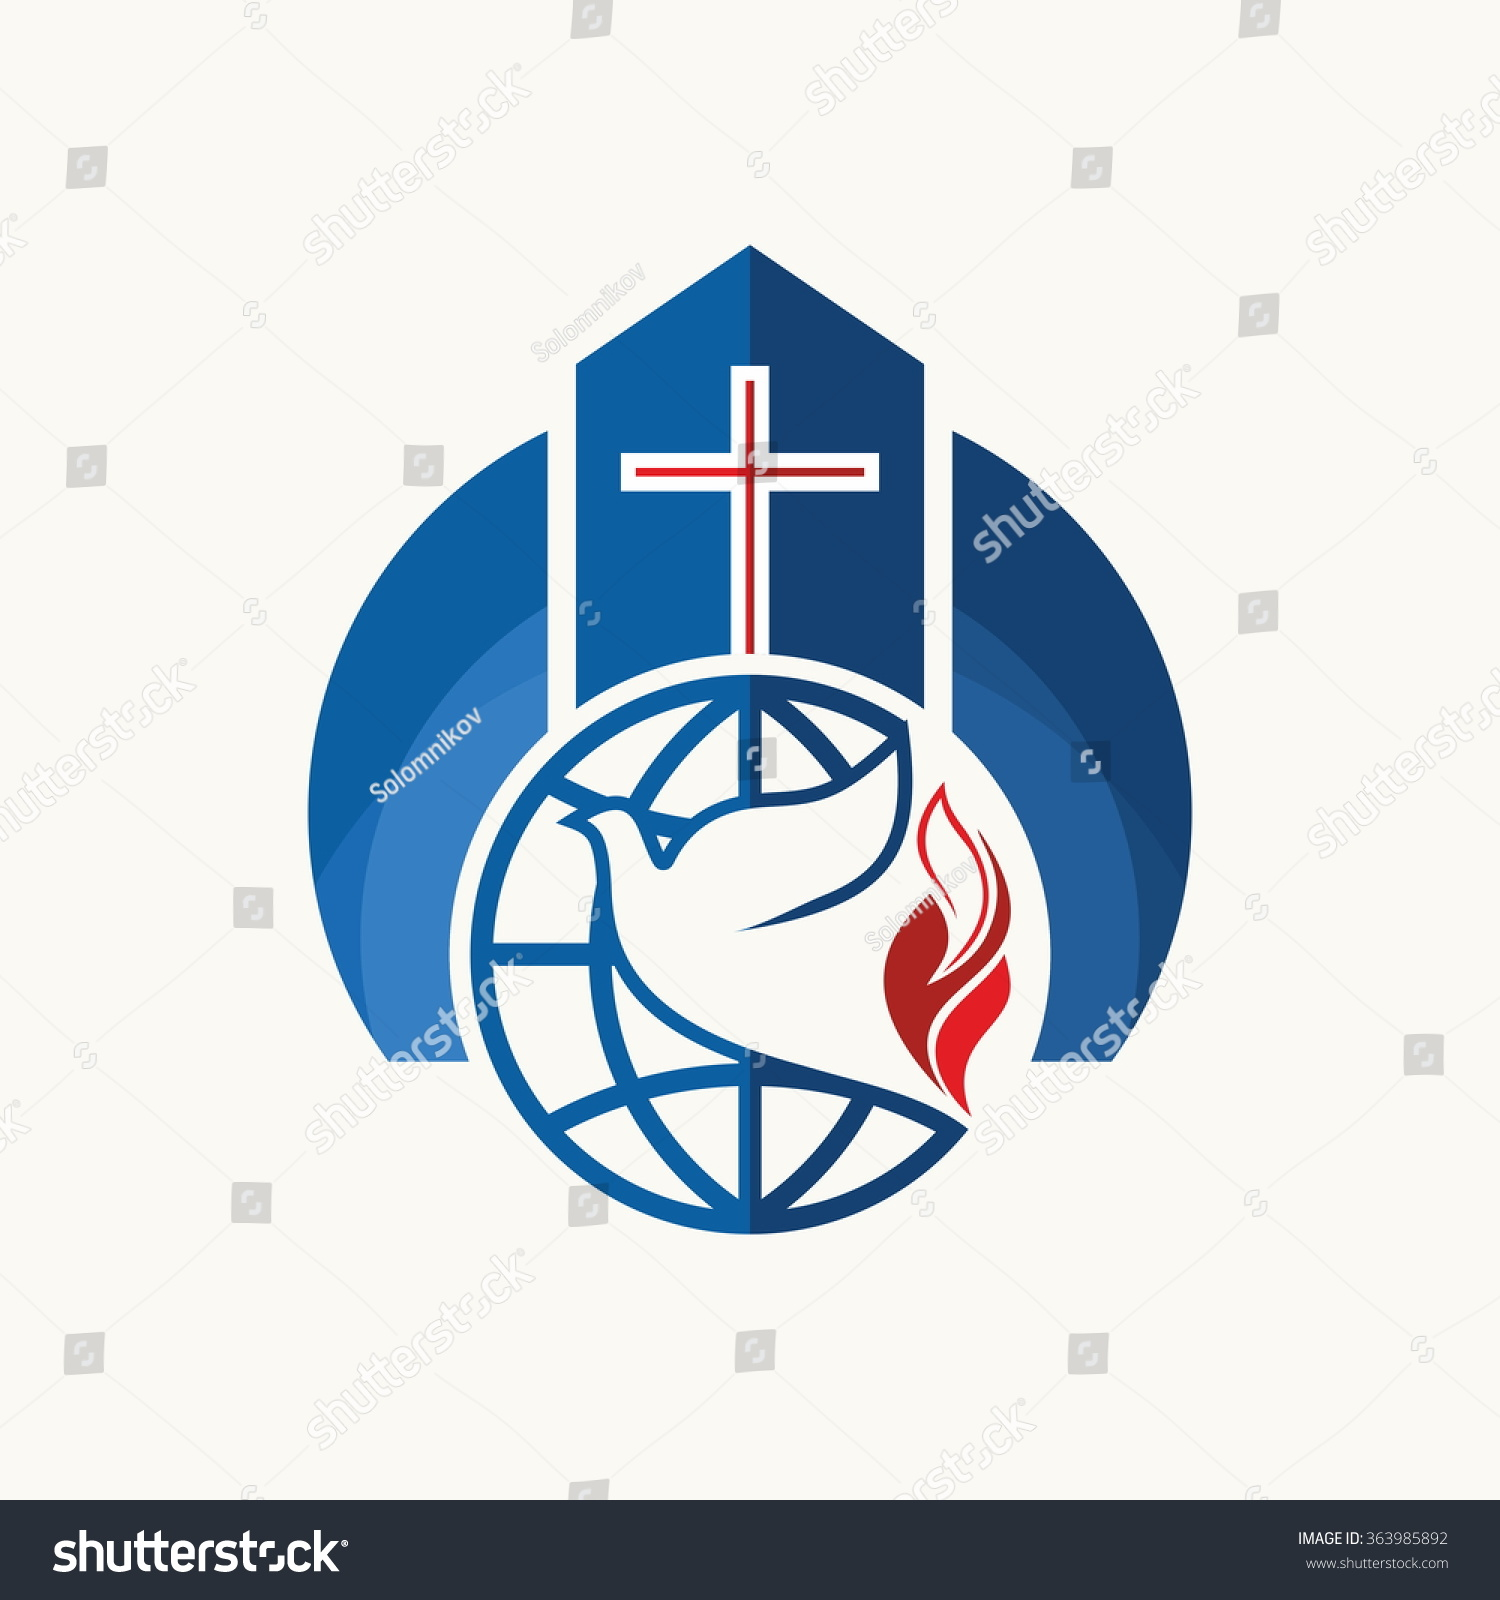 christian symbols dove choice image meaning of text symbols